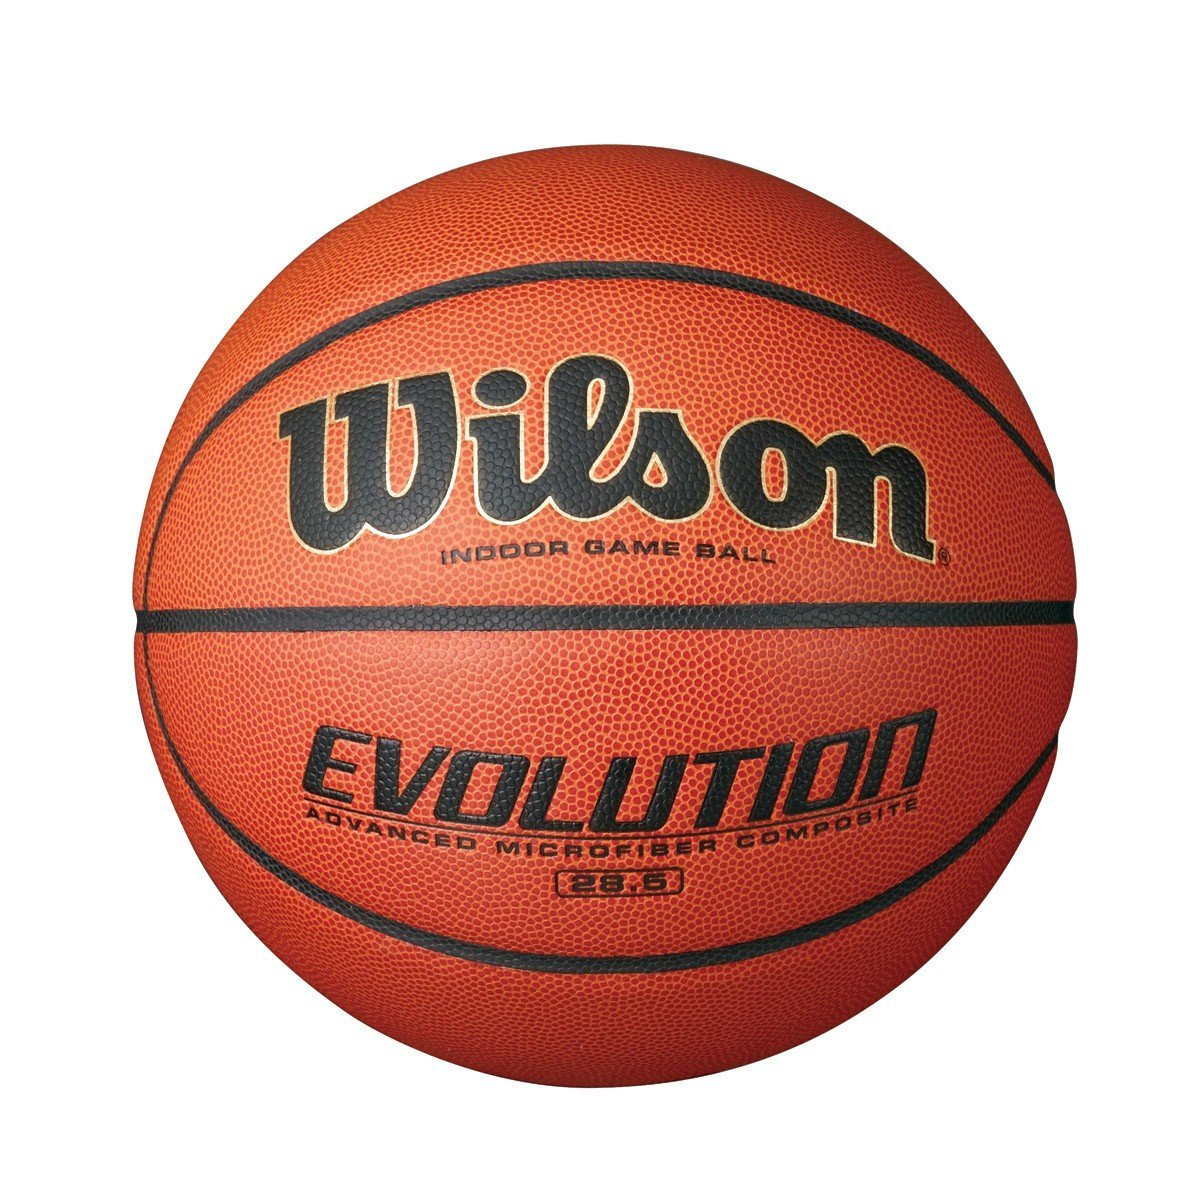 Wilson Evolution Intermediate Basketball 28.5